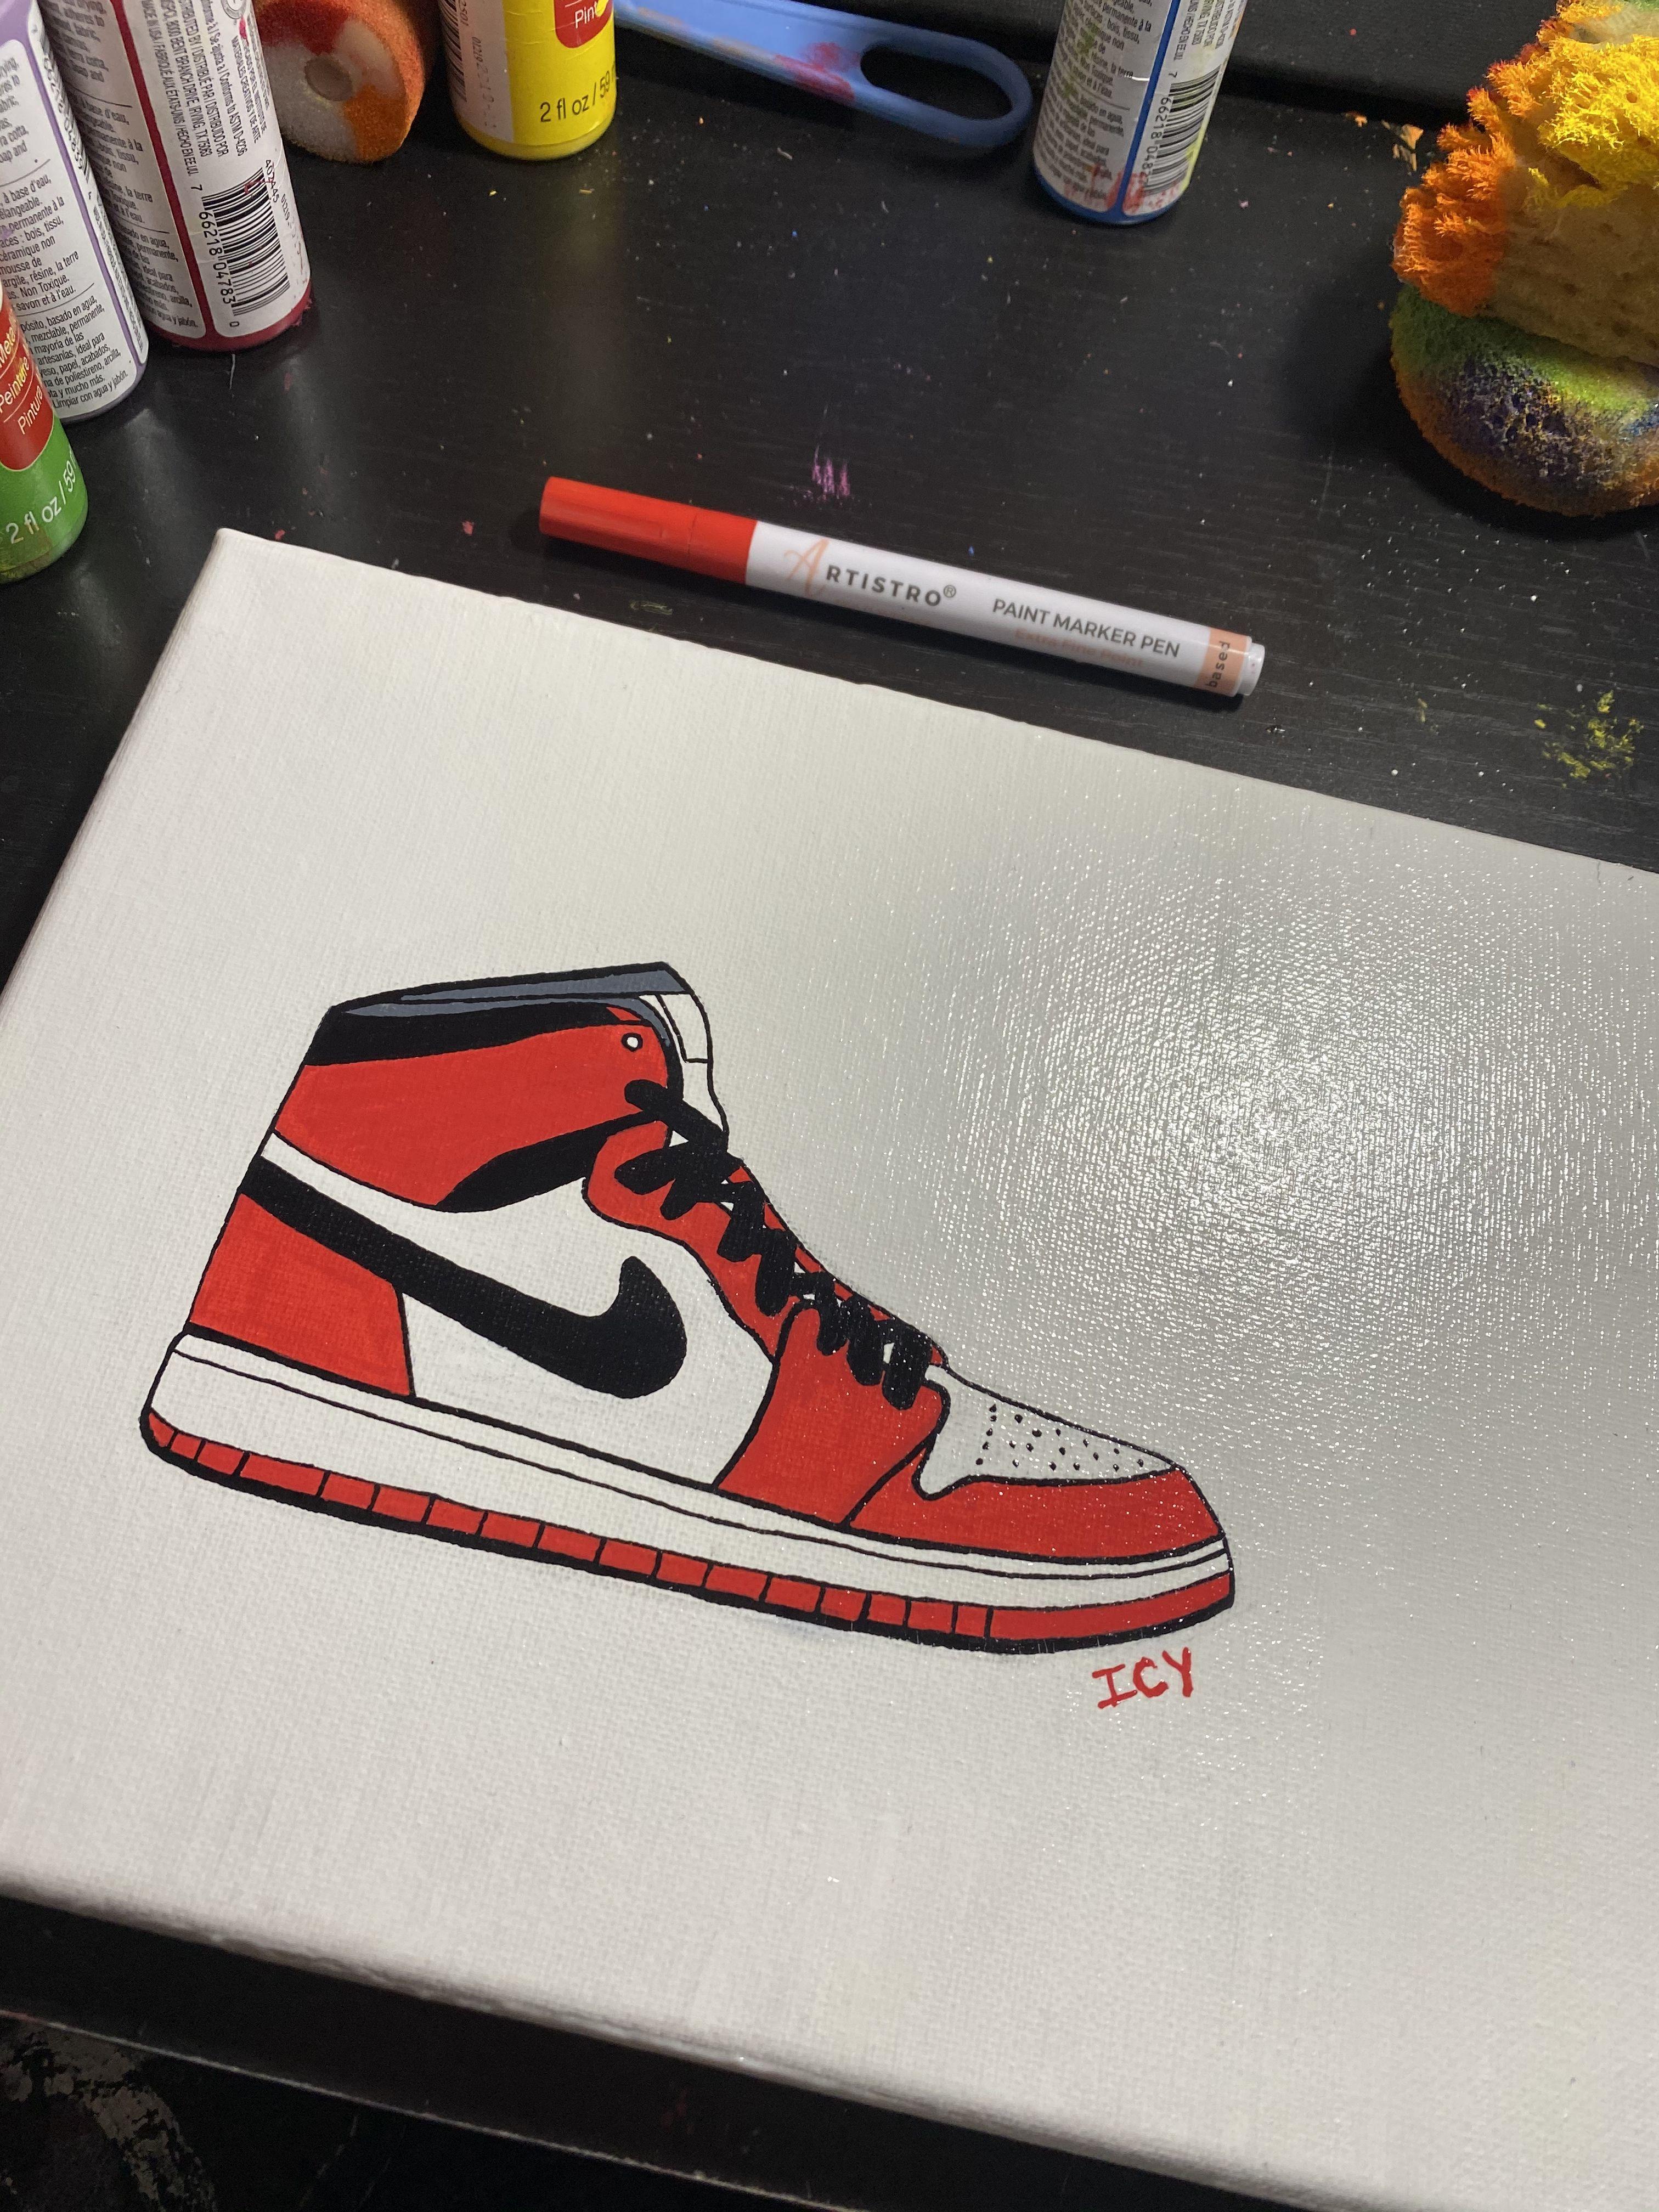 Air Jordan 1s Canvas Painting Canvas Art Painting Canvas Drawings Mini Canvas Art